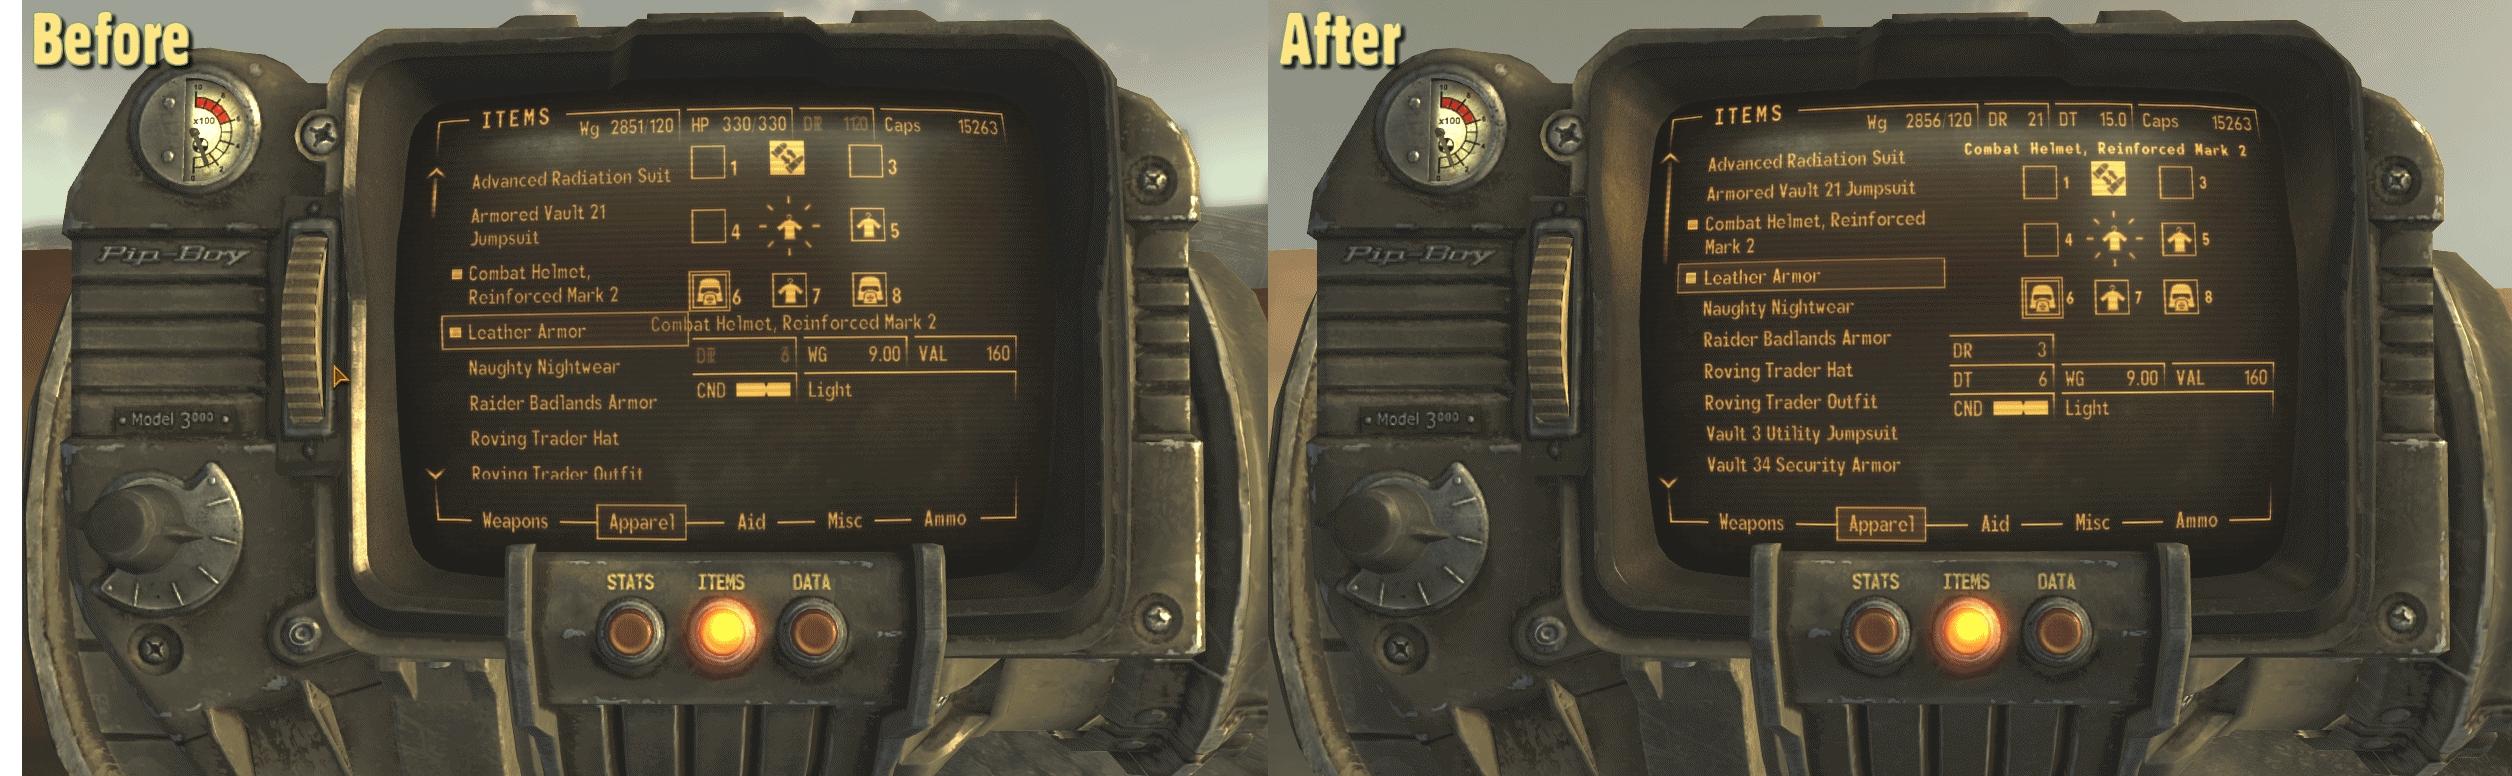 Image 3.png - Fallout: New Vegas